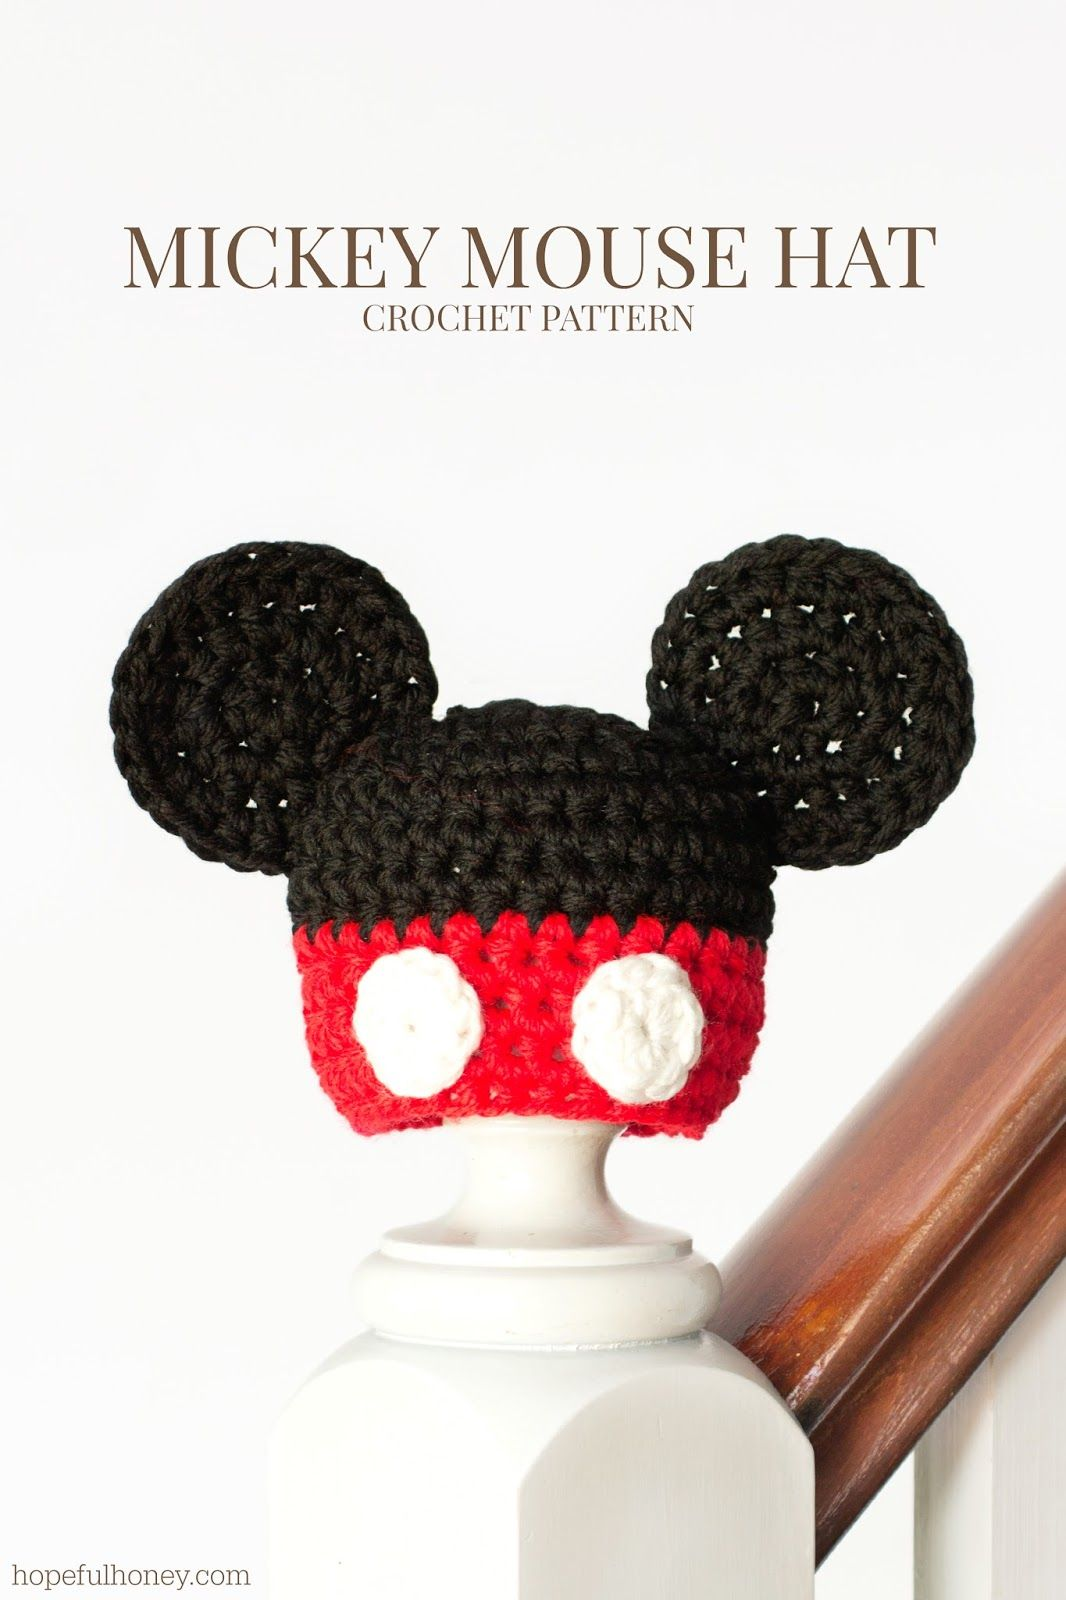 Newborn Mickey Mouse Inspired Hat Crochet Pattern | Hopeful honey ...